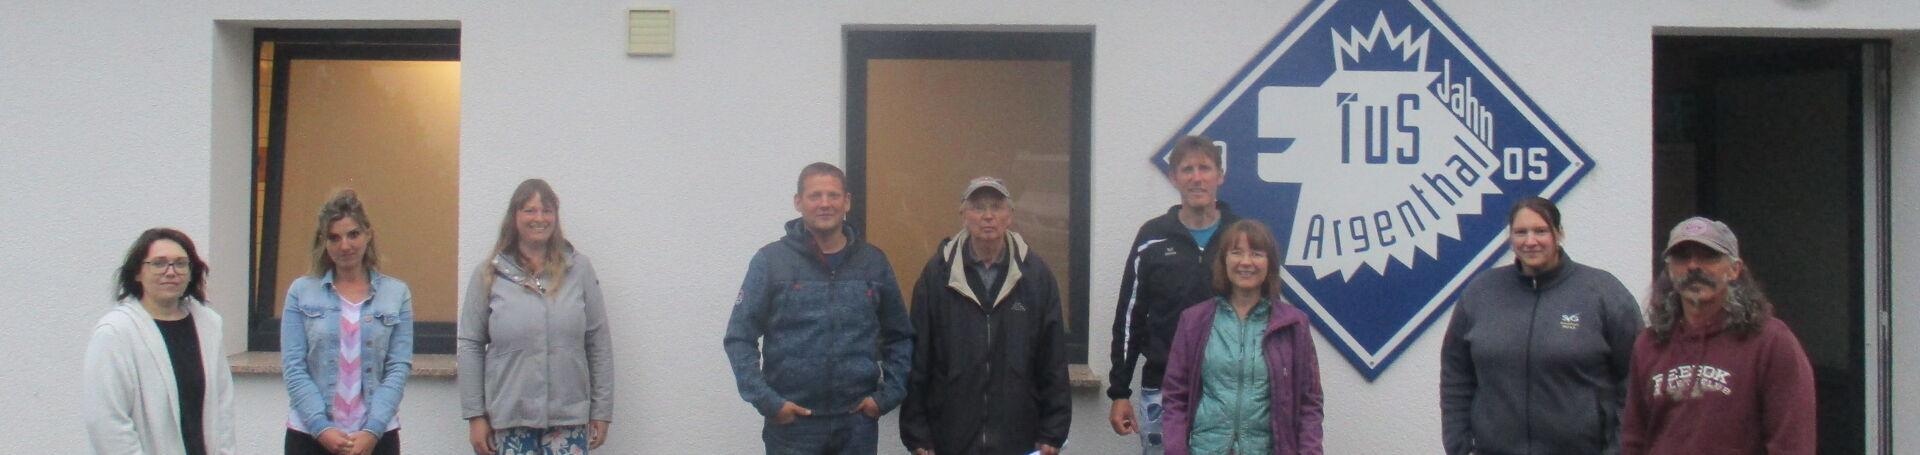 Gründungsmitglieder Förderverein